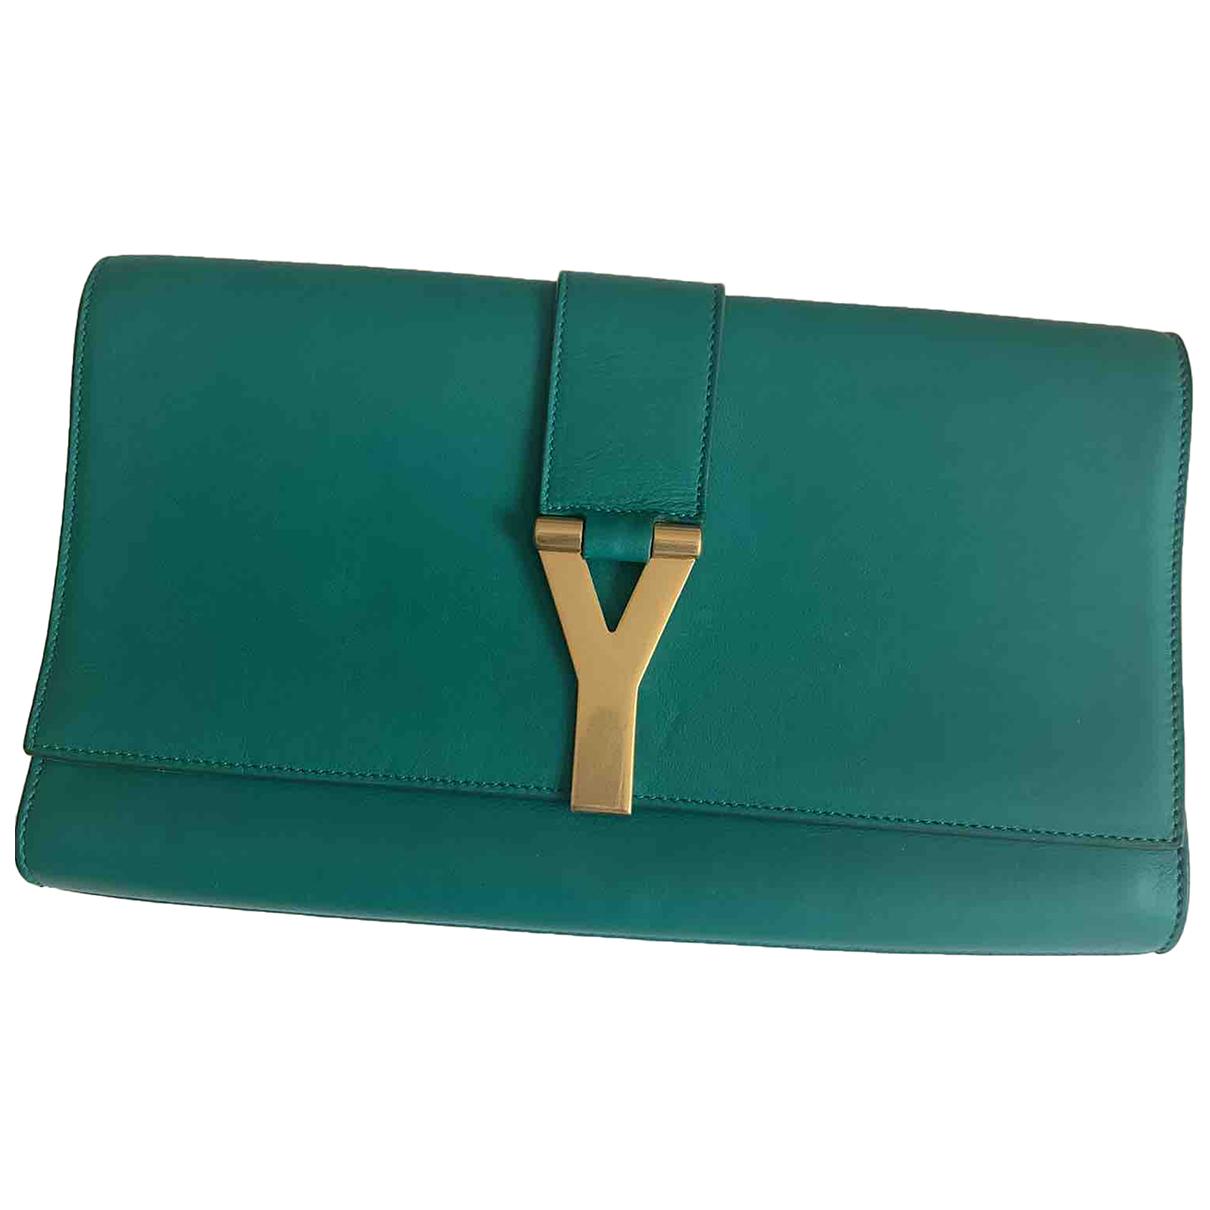 Saint Laurent Chyc Green Leather Clutch bag for Women \N